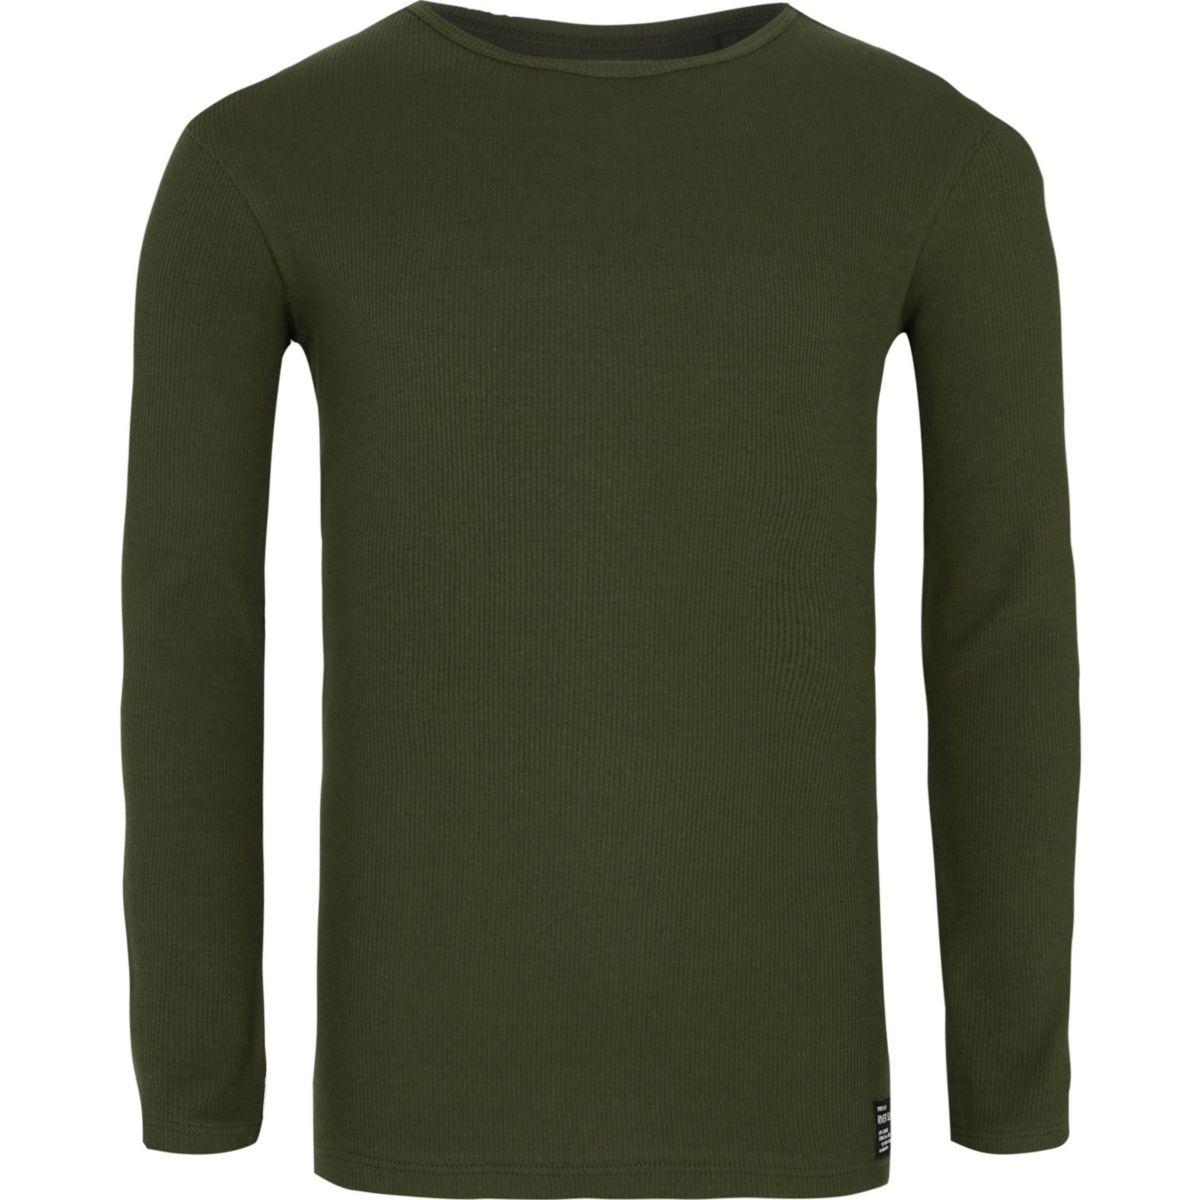 Boys khaki green ribbed long sleeve T-shirt